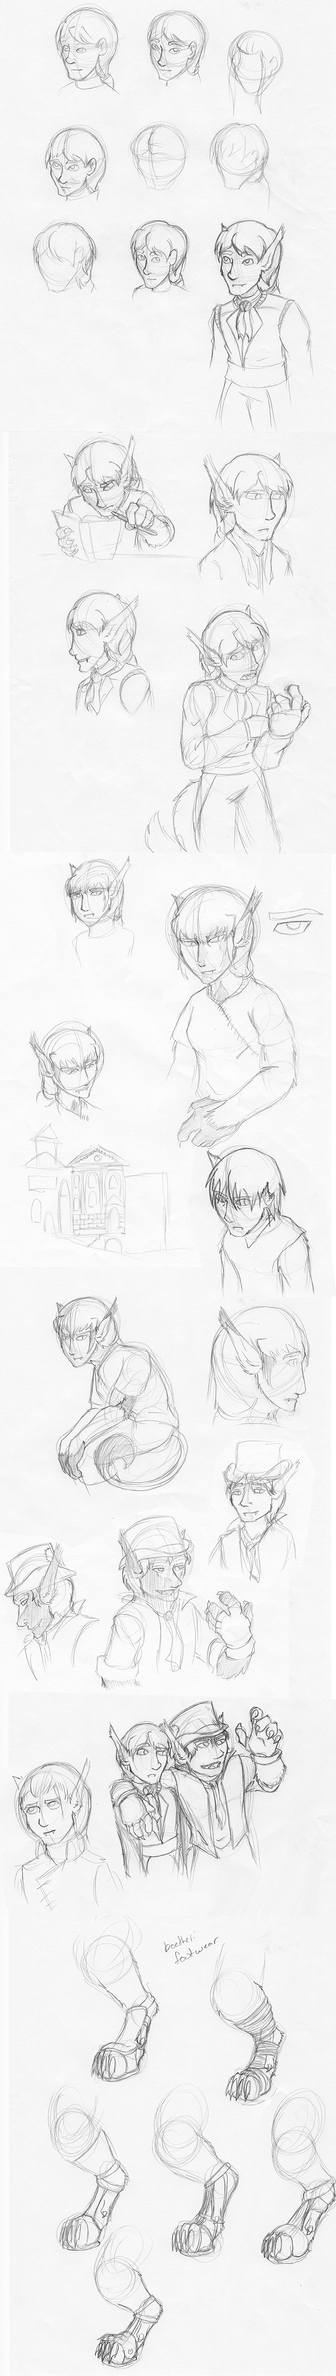 TM2 Sketchdump2 by dragonsong12